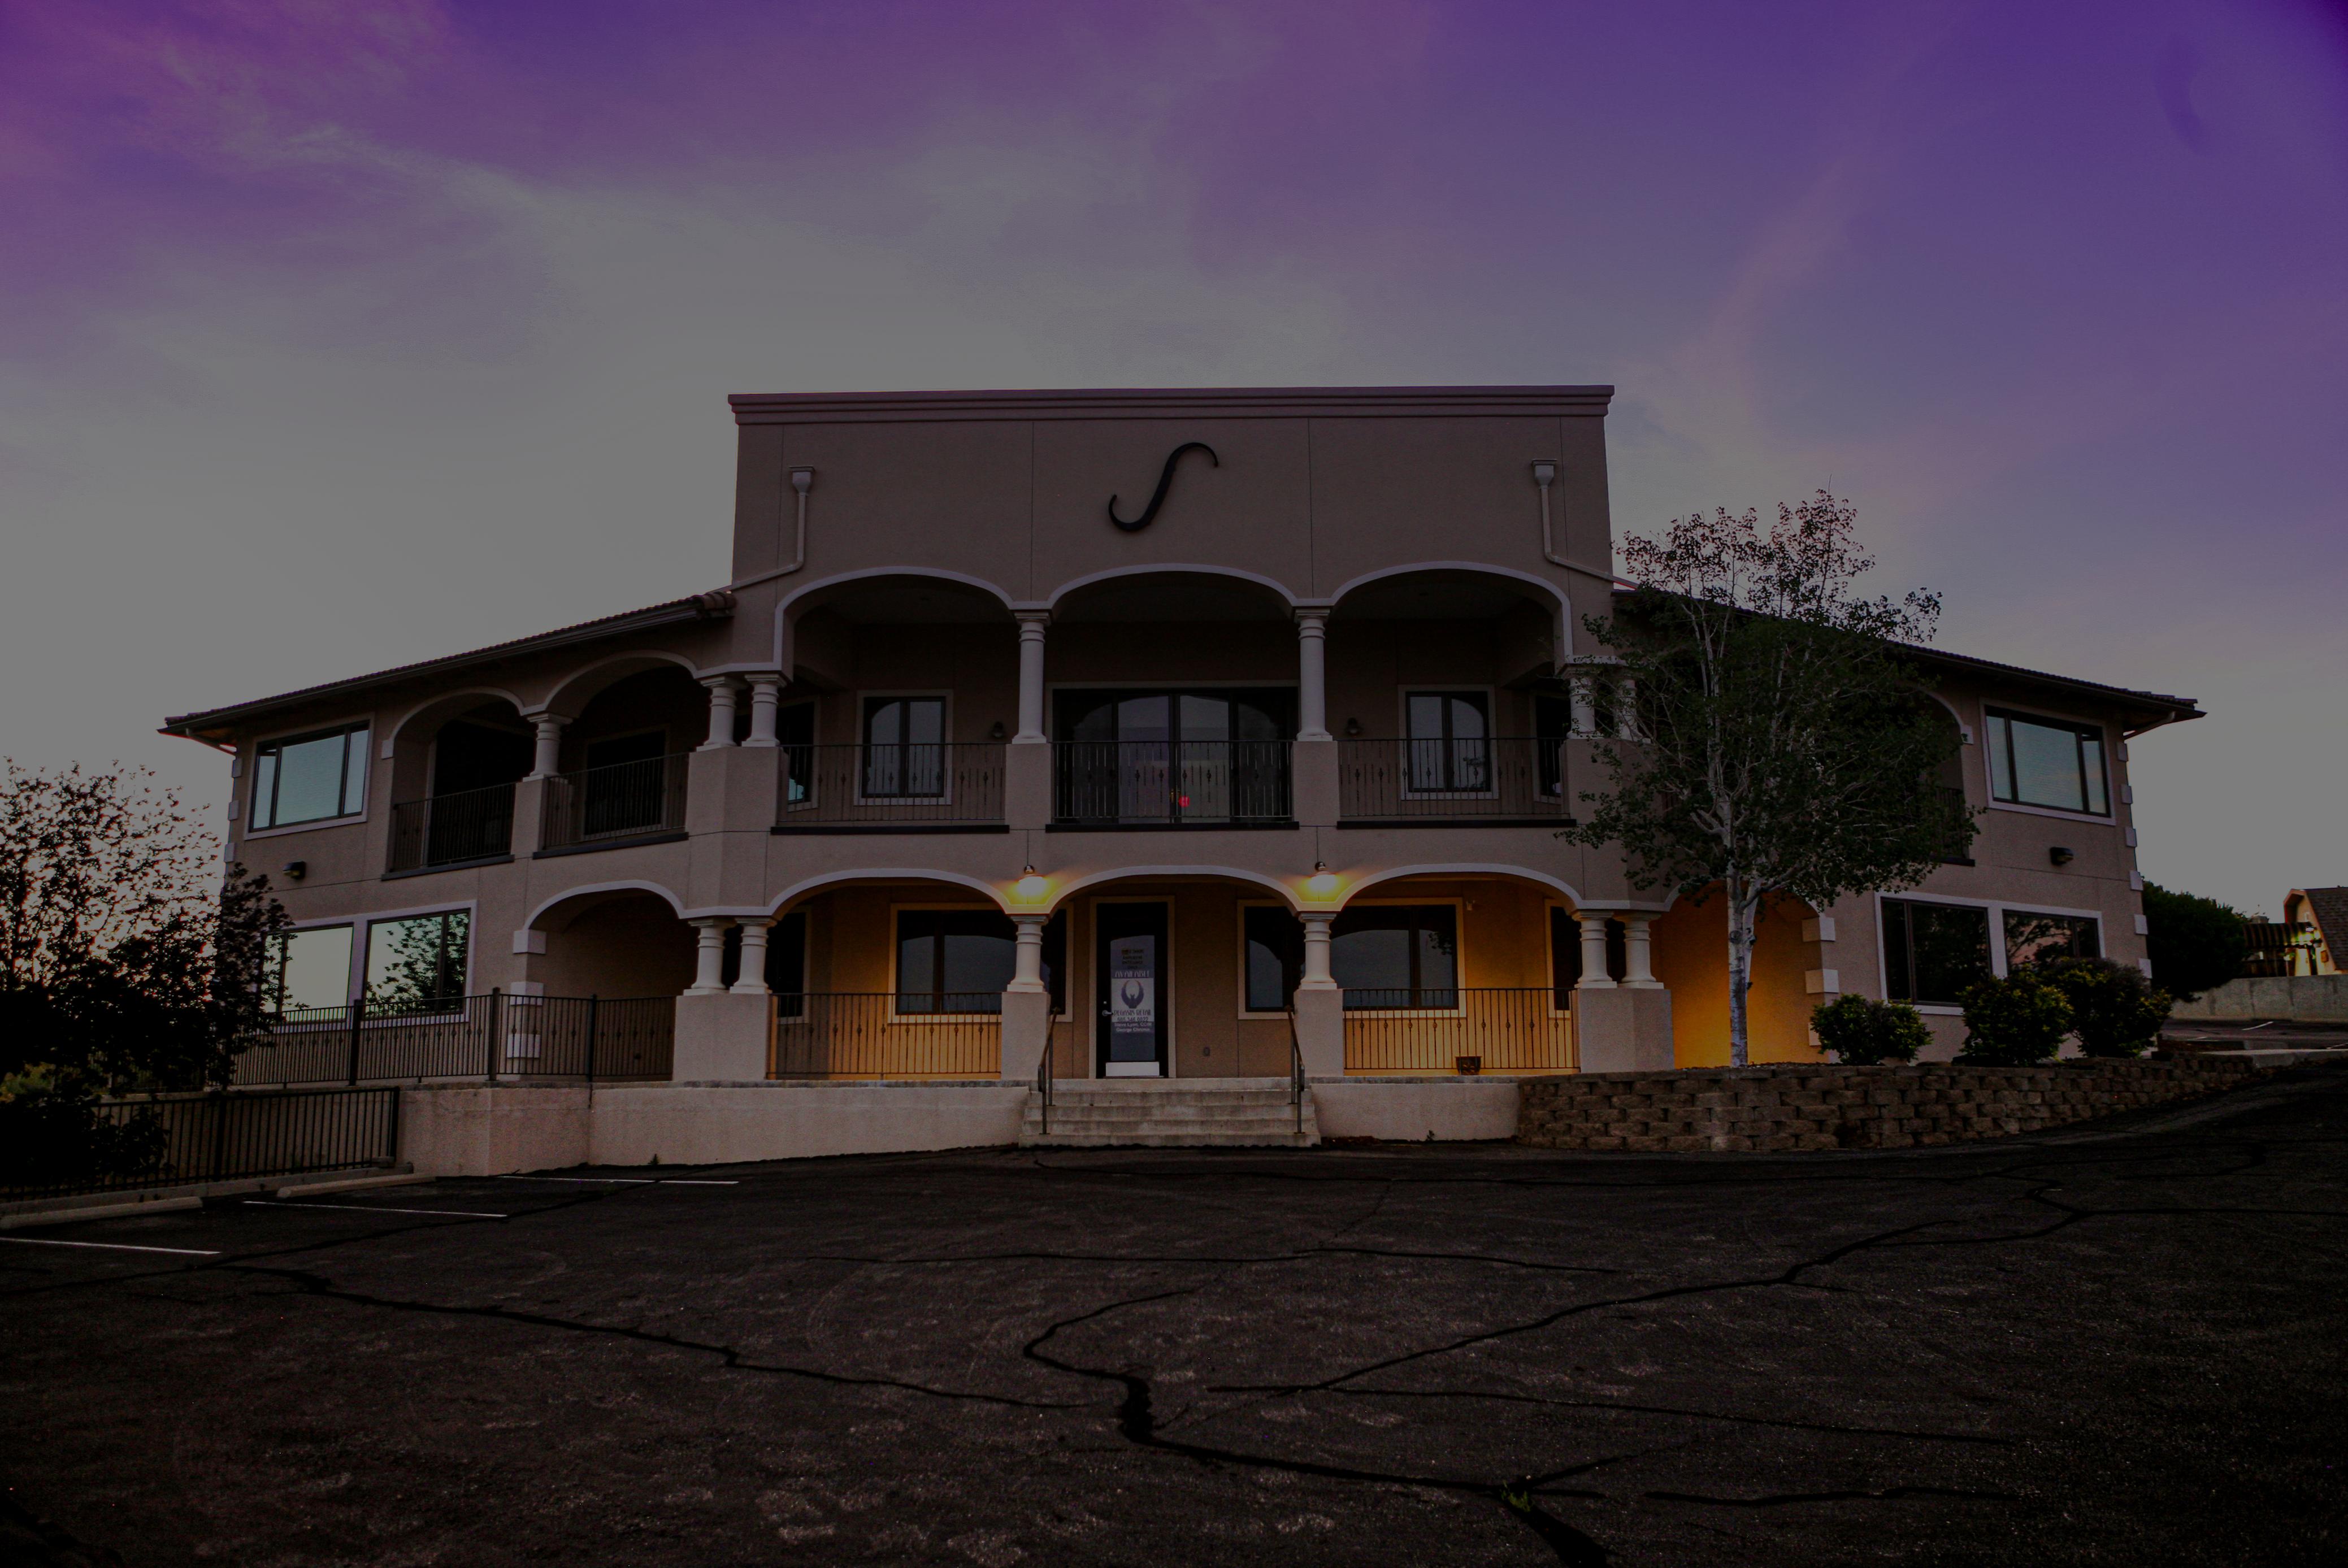 SJ Health and Wellness Center